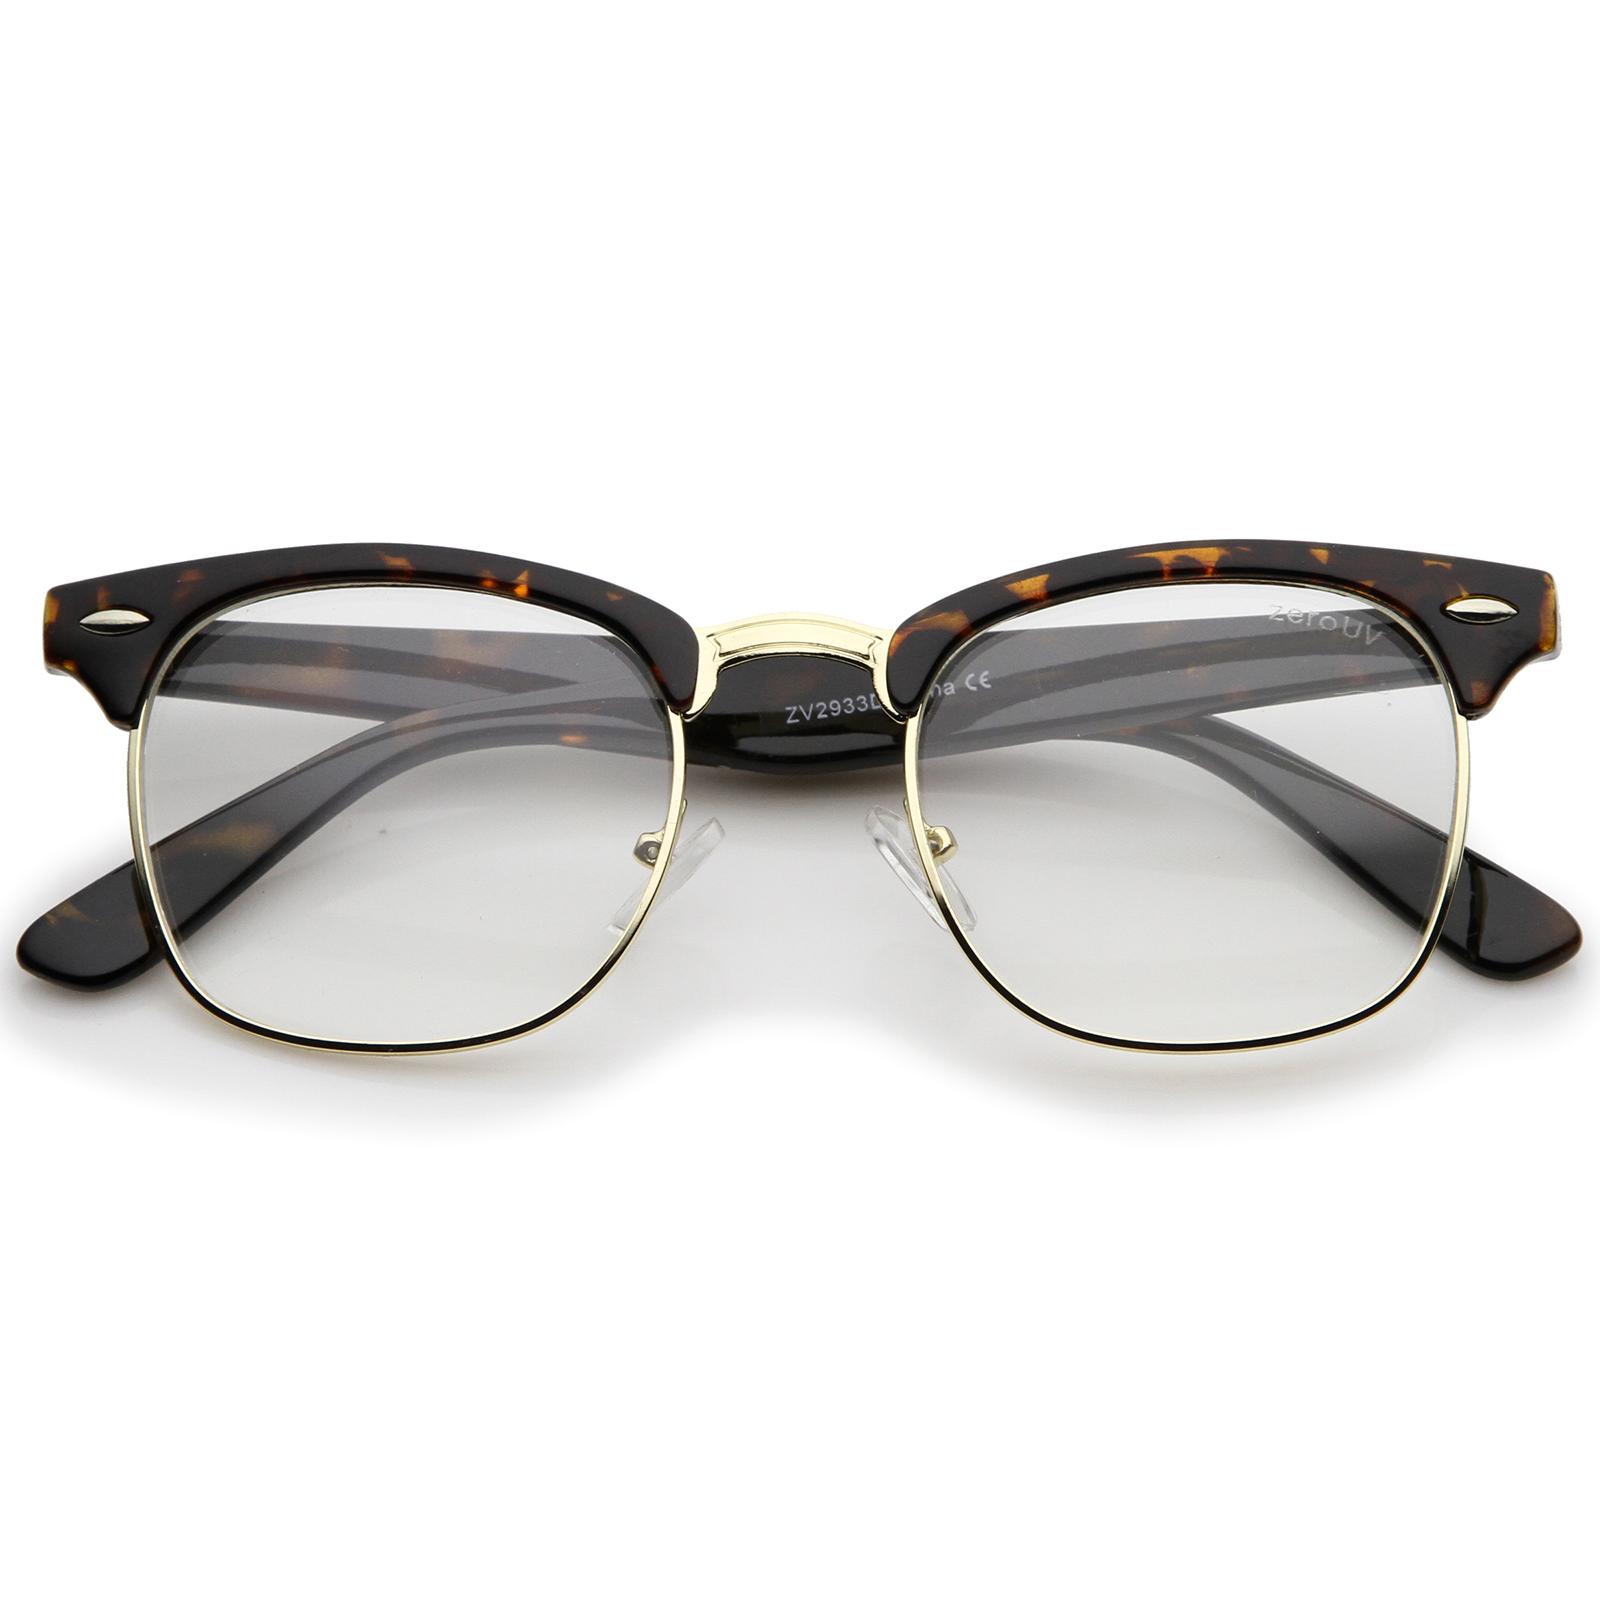 Half Frame Square Glasses : zeroUV Retro Square Clear Lens Horn Rimmed Half-Frame ...